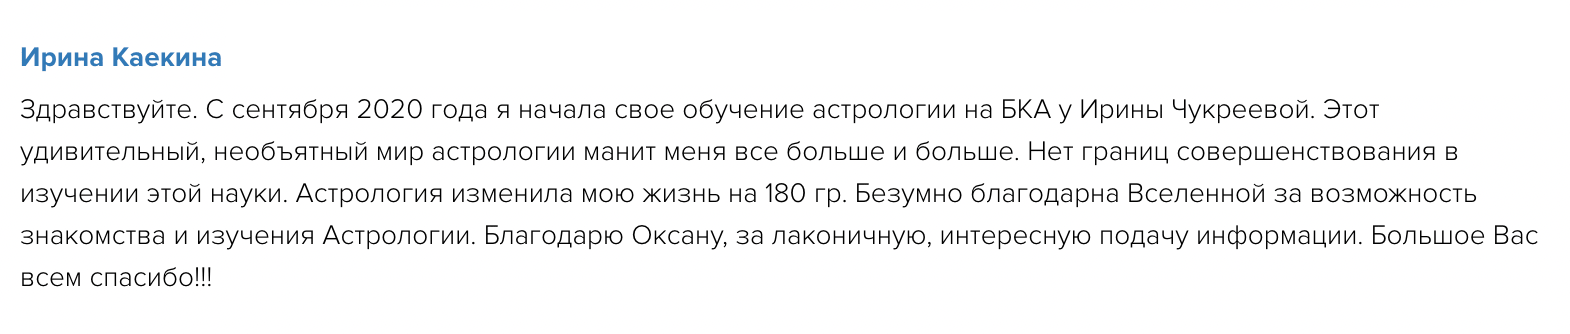 Отзыв 5